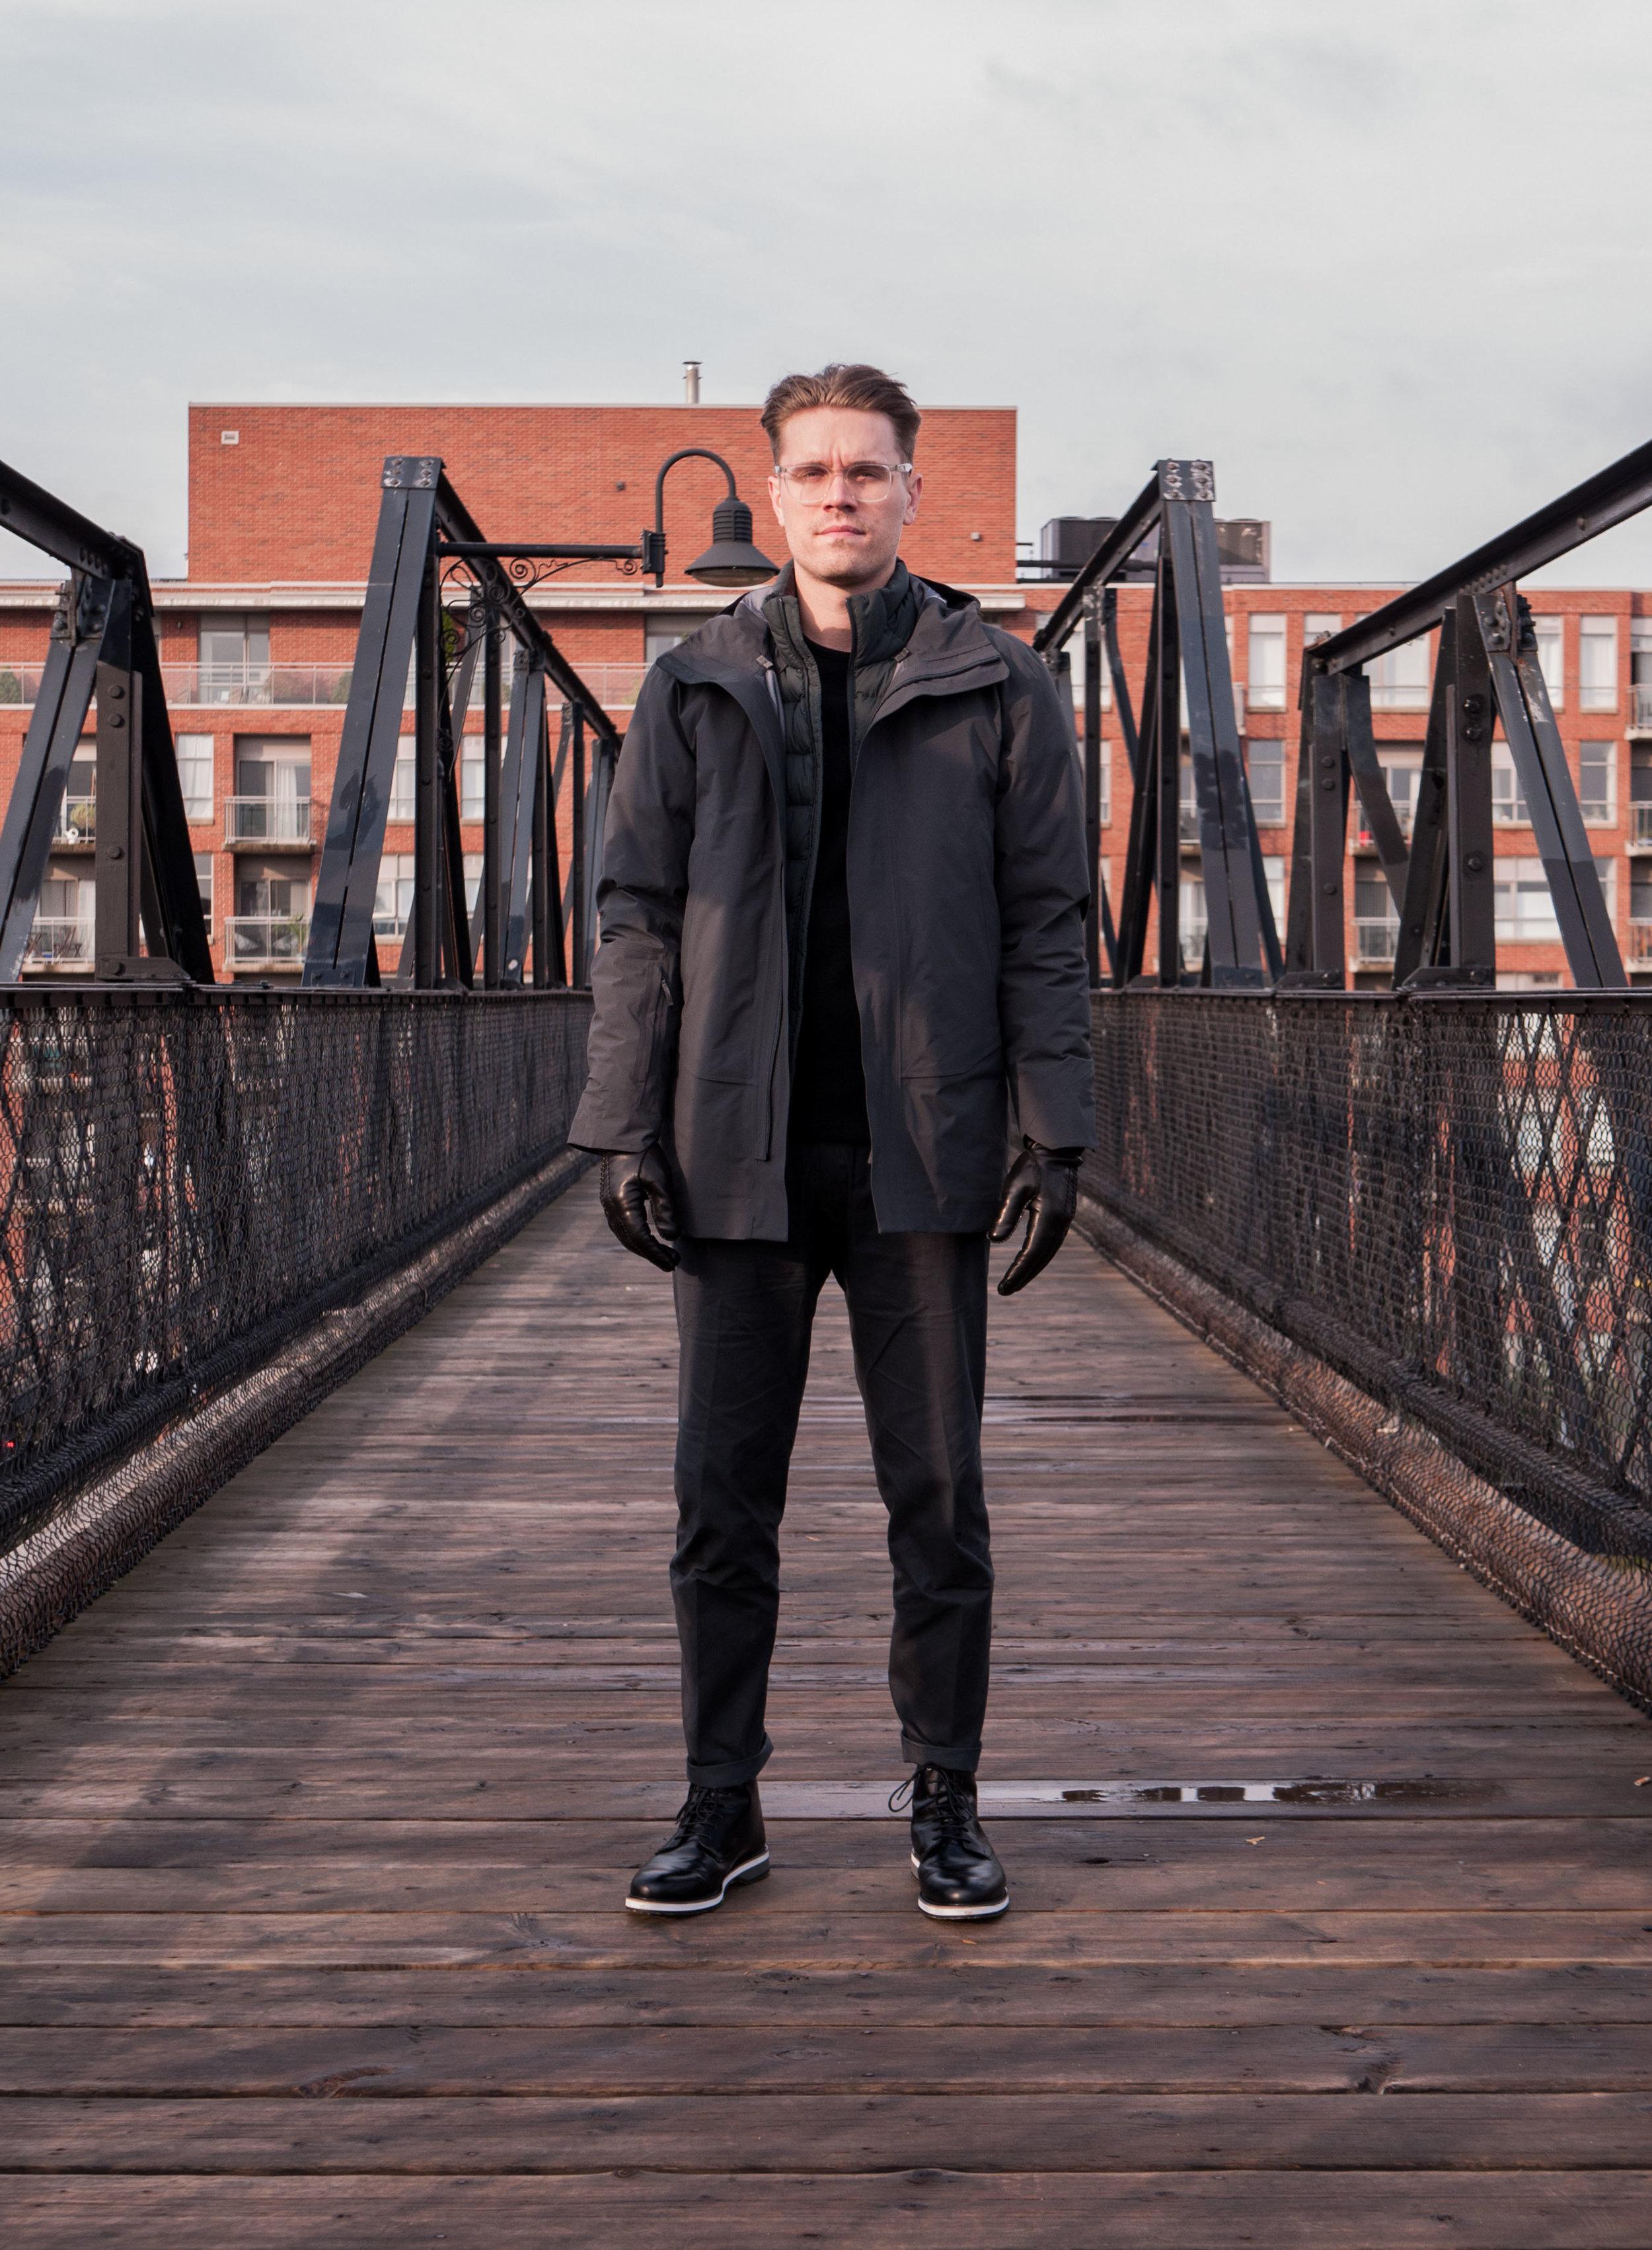 007    Arc'teryx Veilance Jacket, Sweater & Pants     WANT Les Essentiels  Boots     Hestra  Gloves